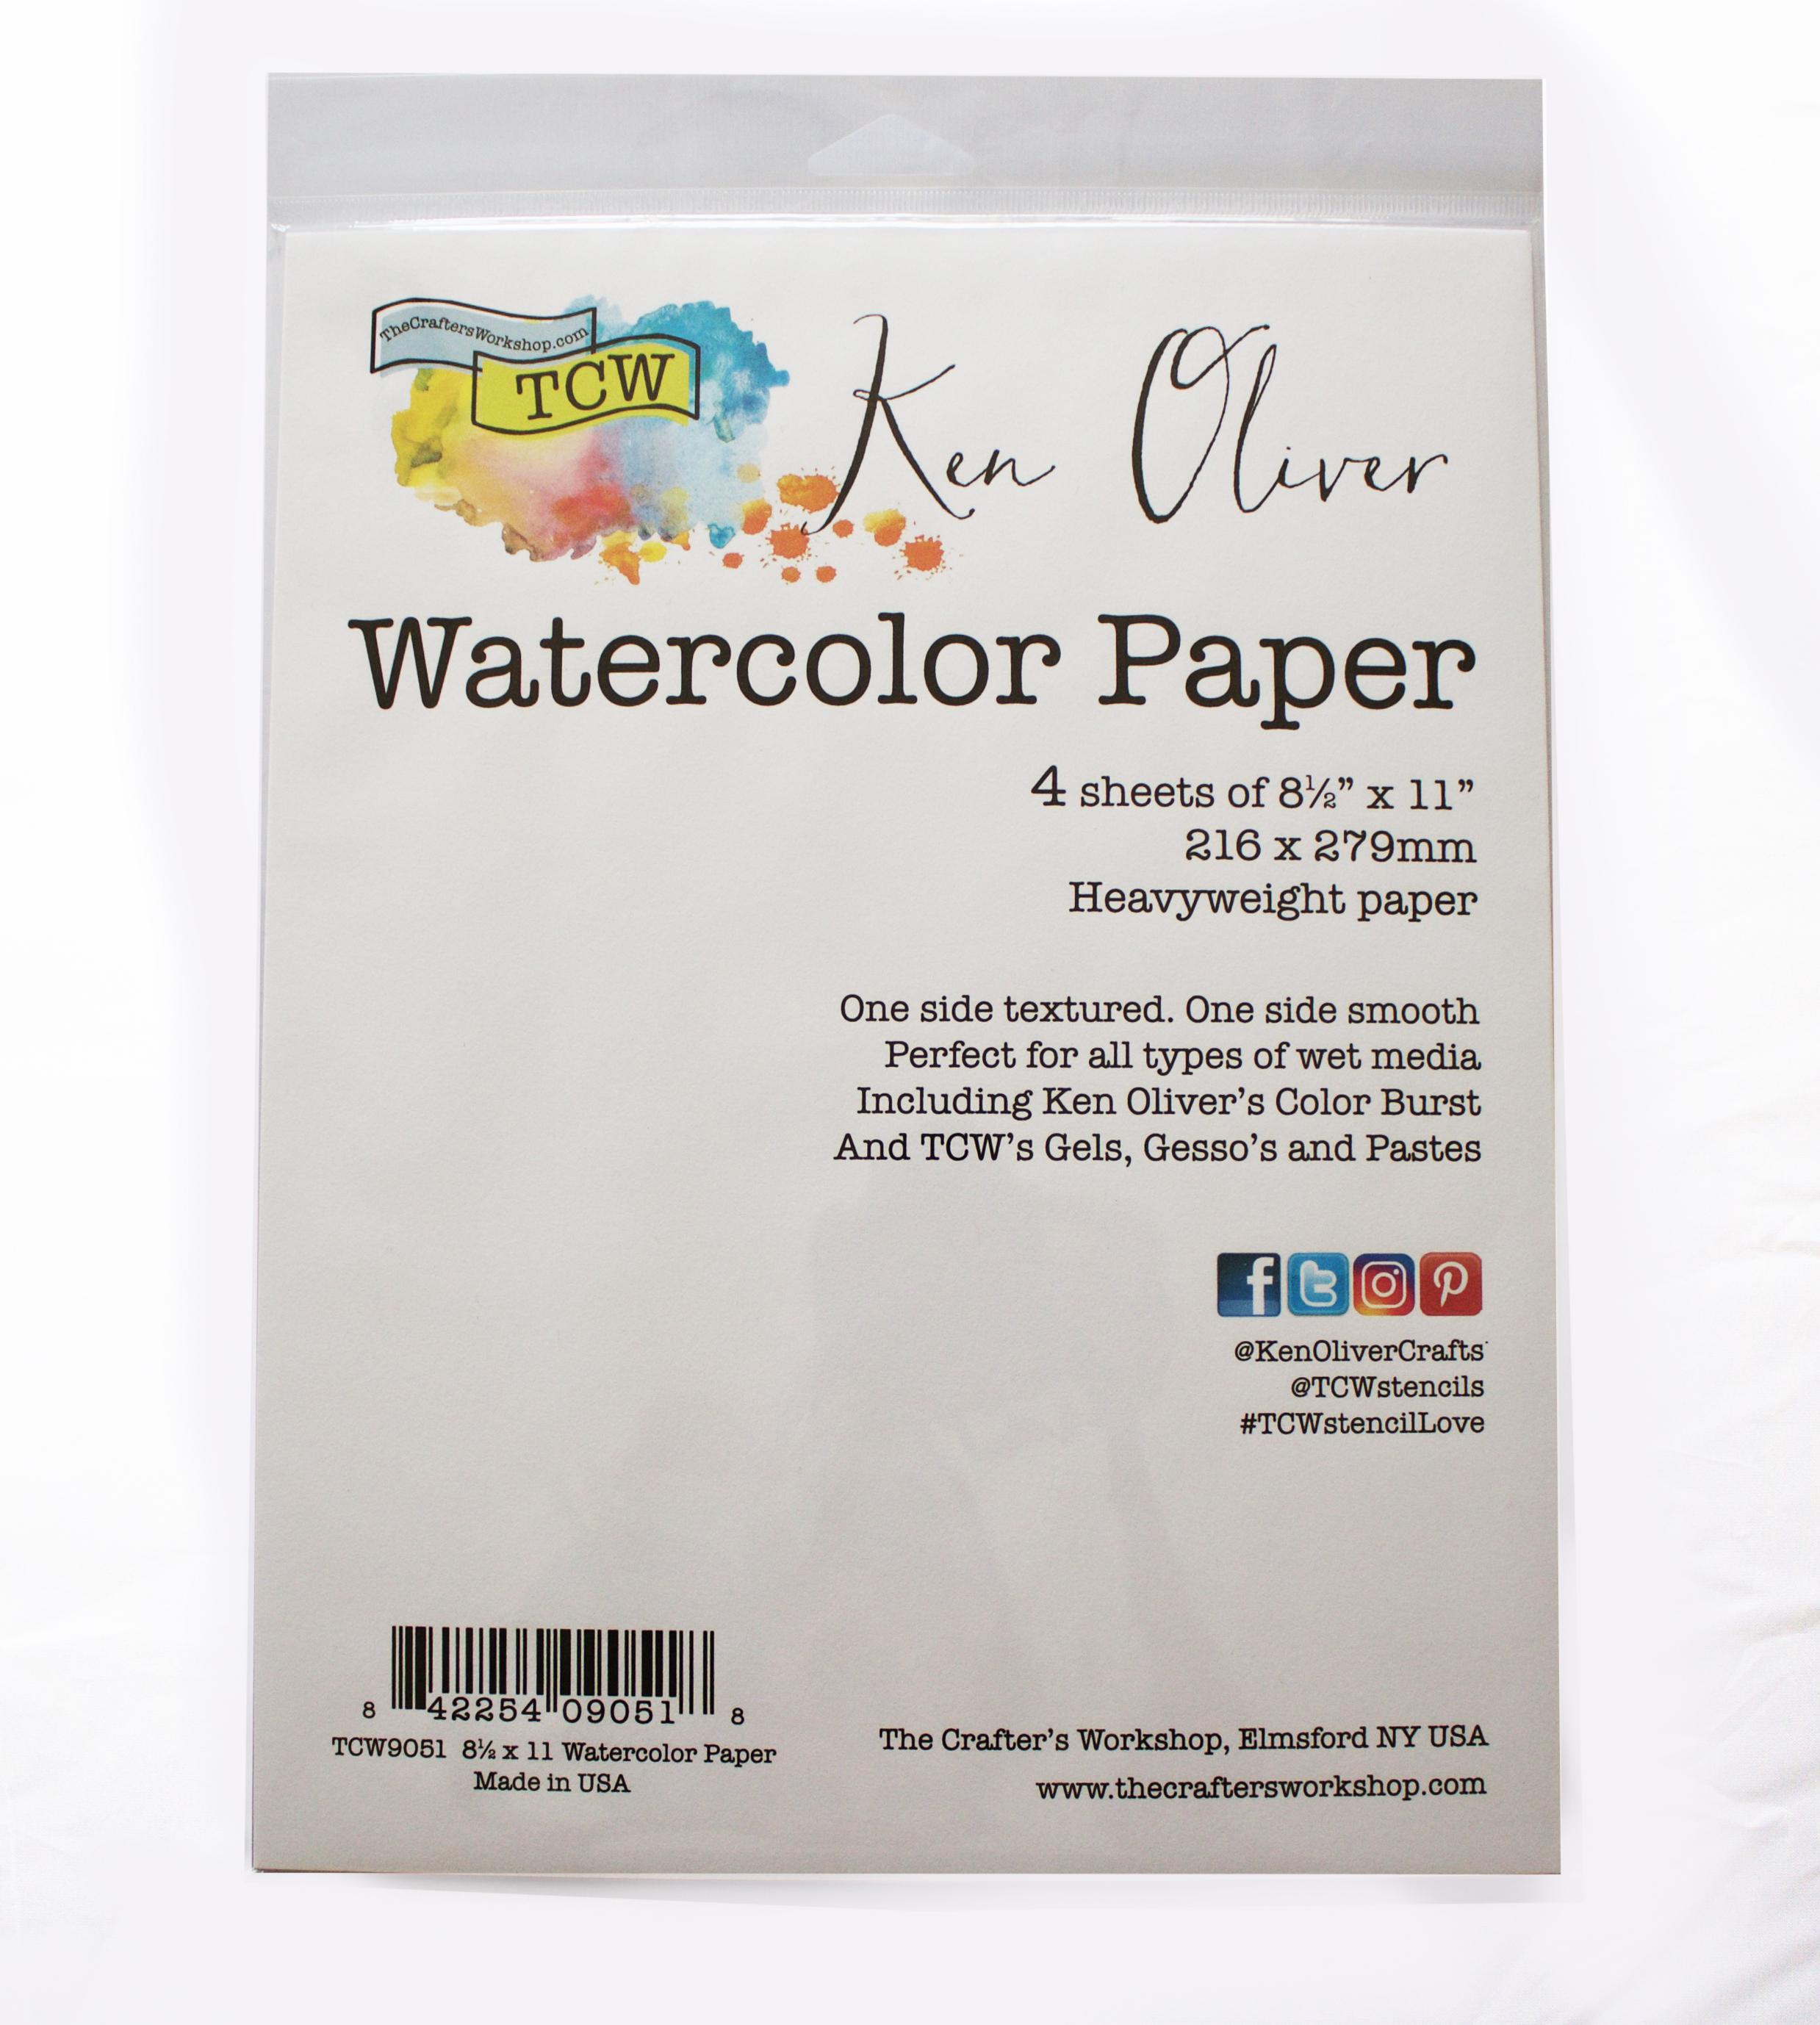 8.5X11 Watercolor Paper Pack